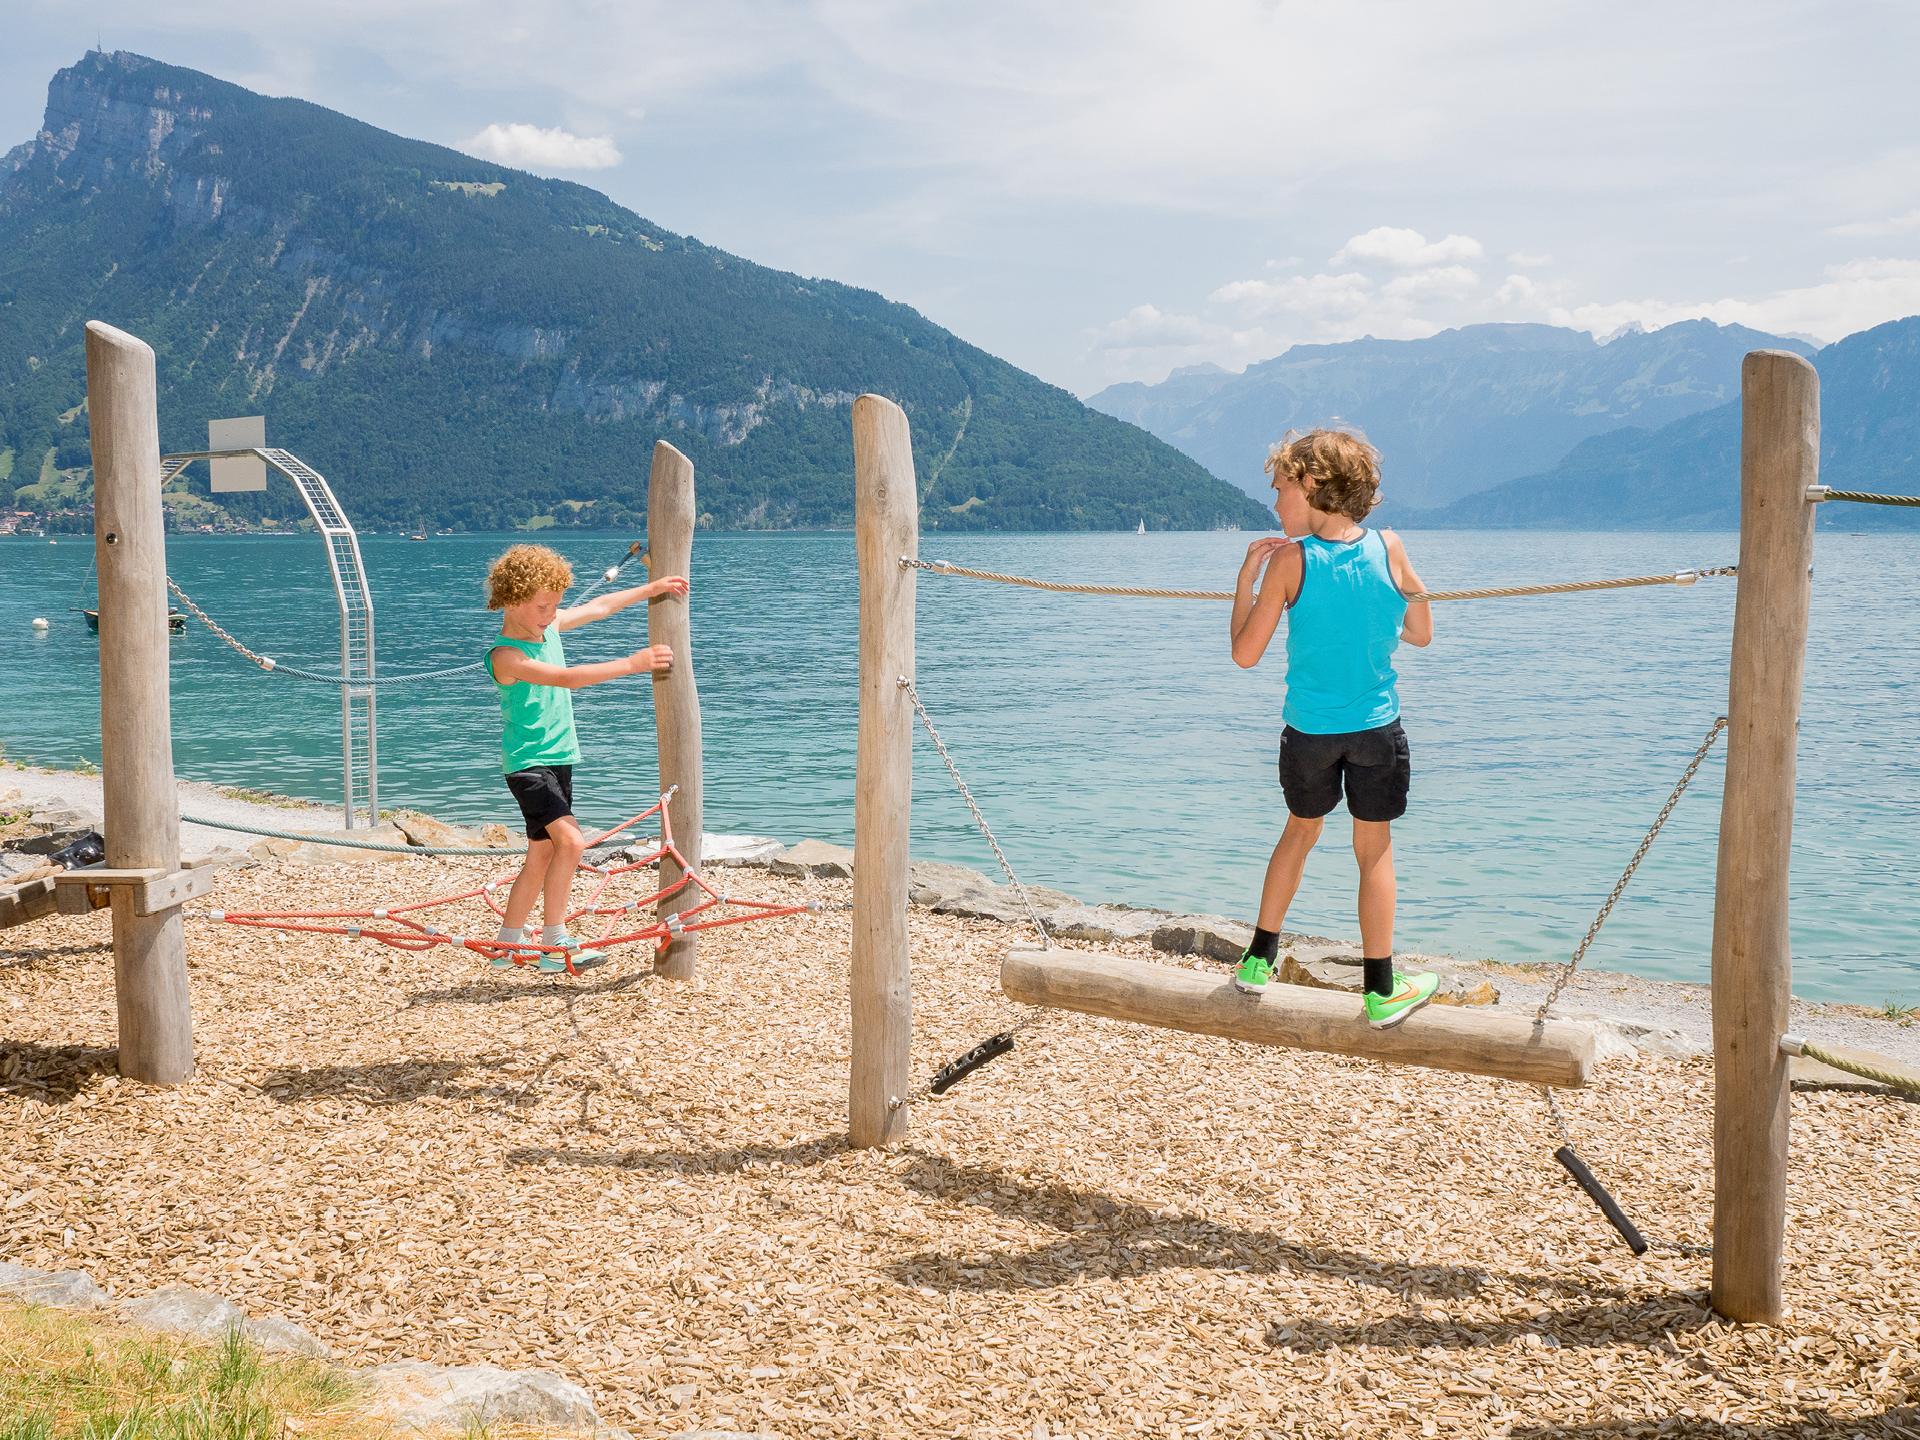 Kinder spielen am Strand am Thunersee